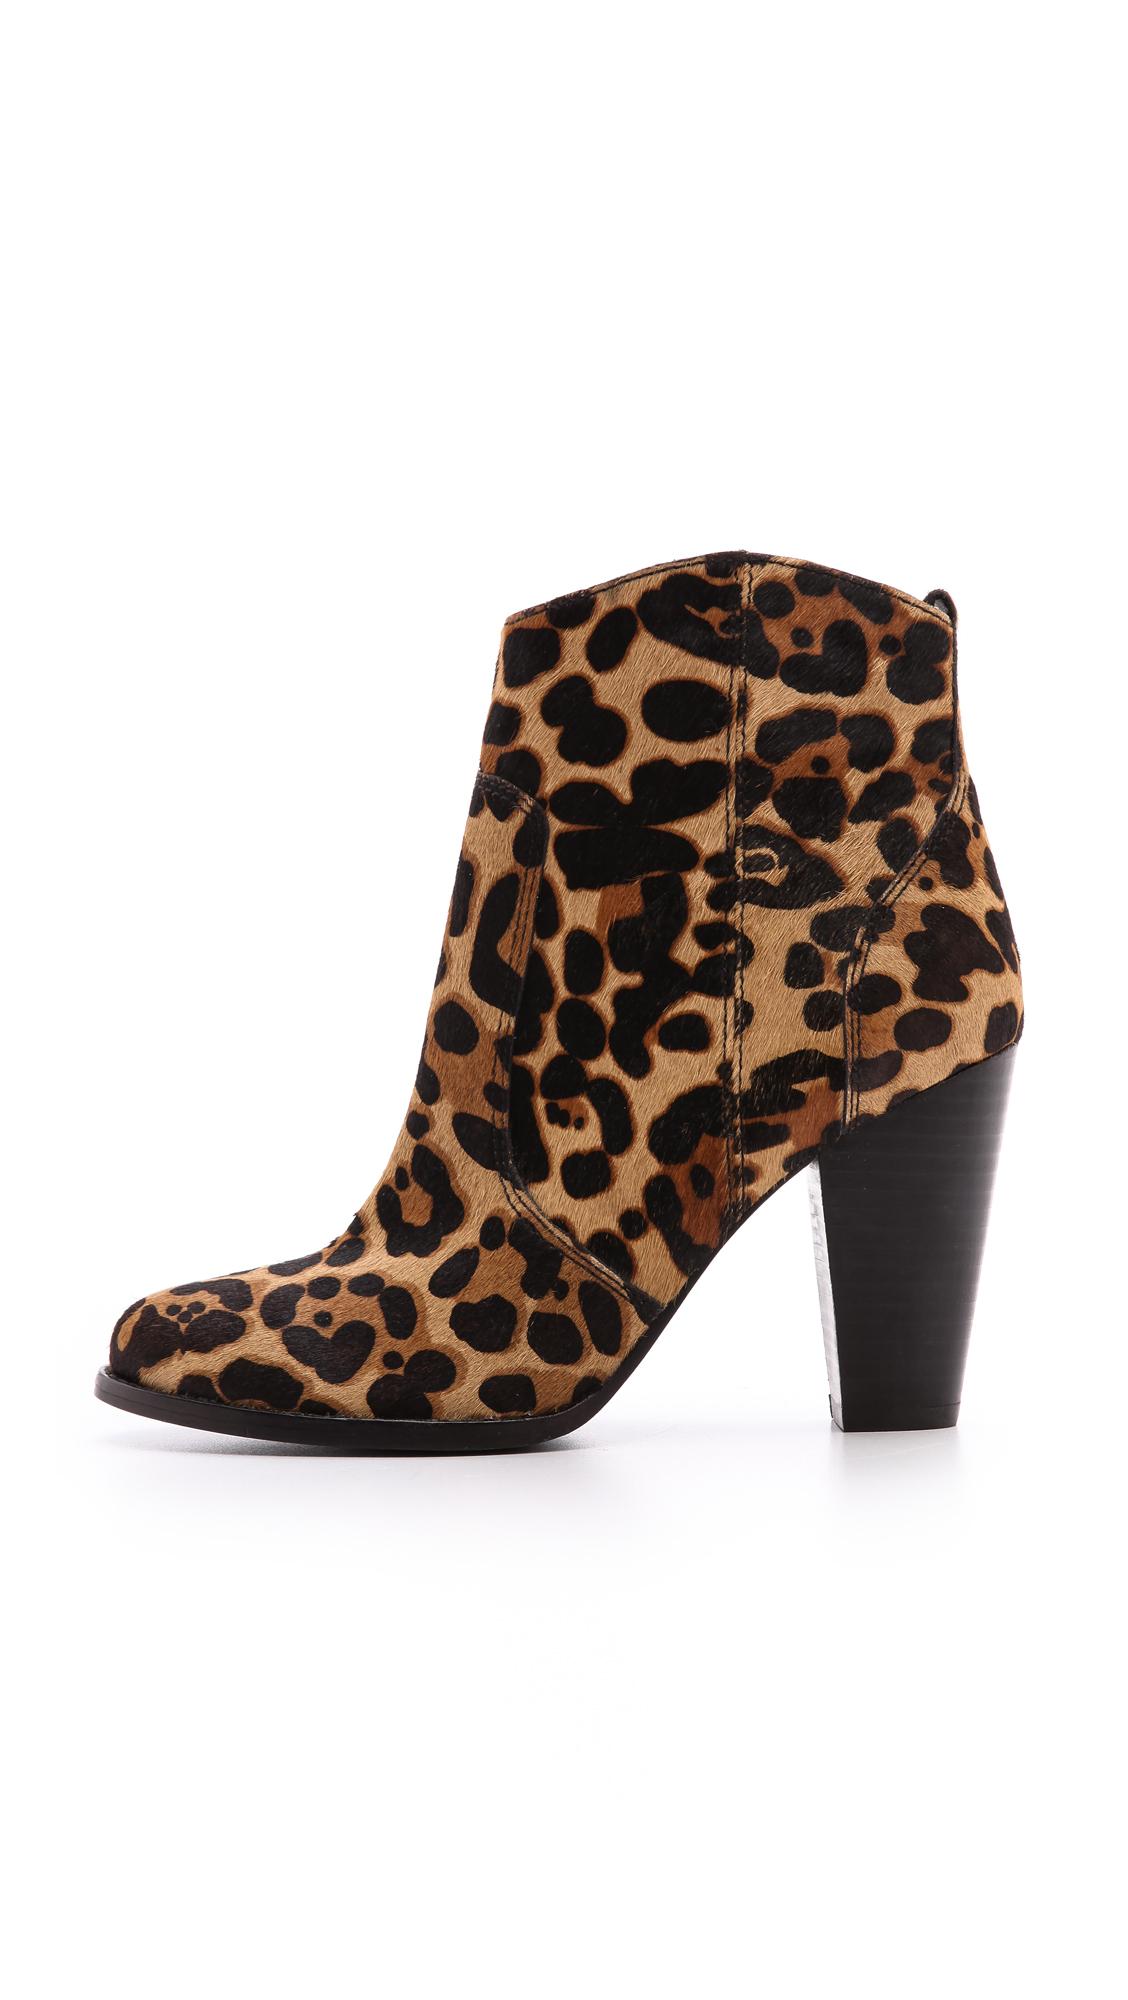 Joie Leather Joie - Leopard